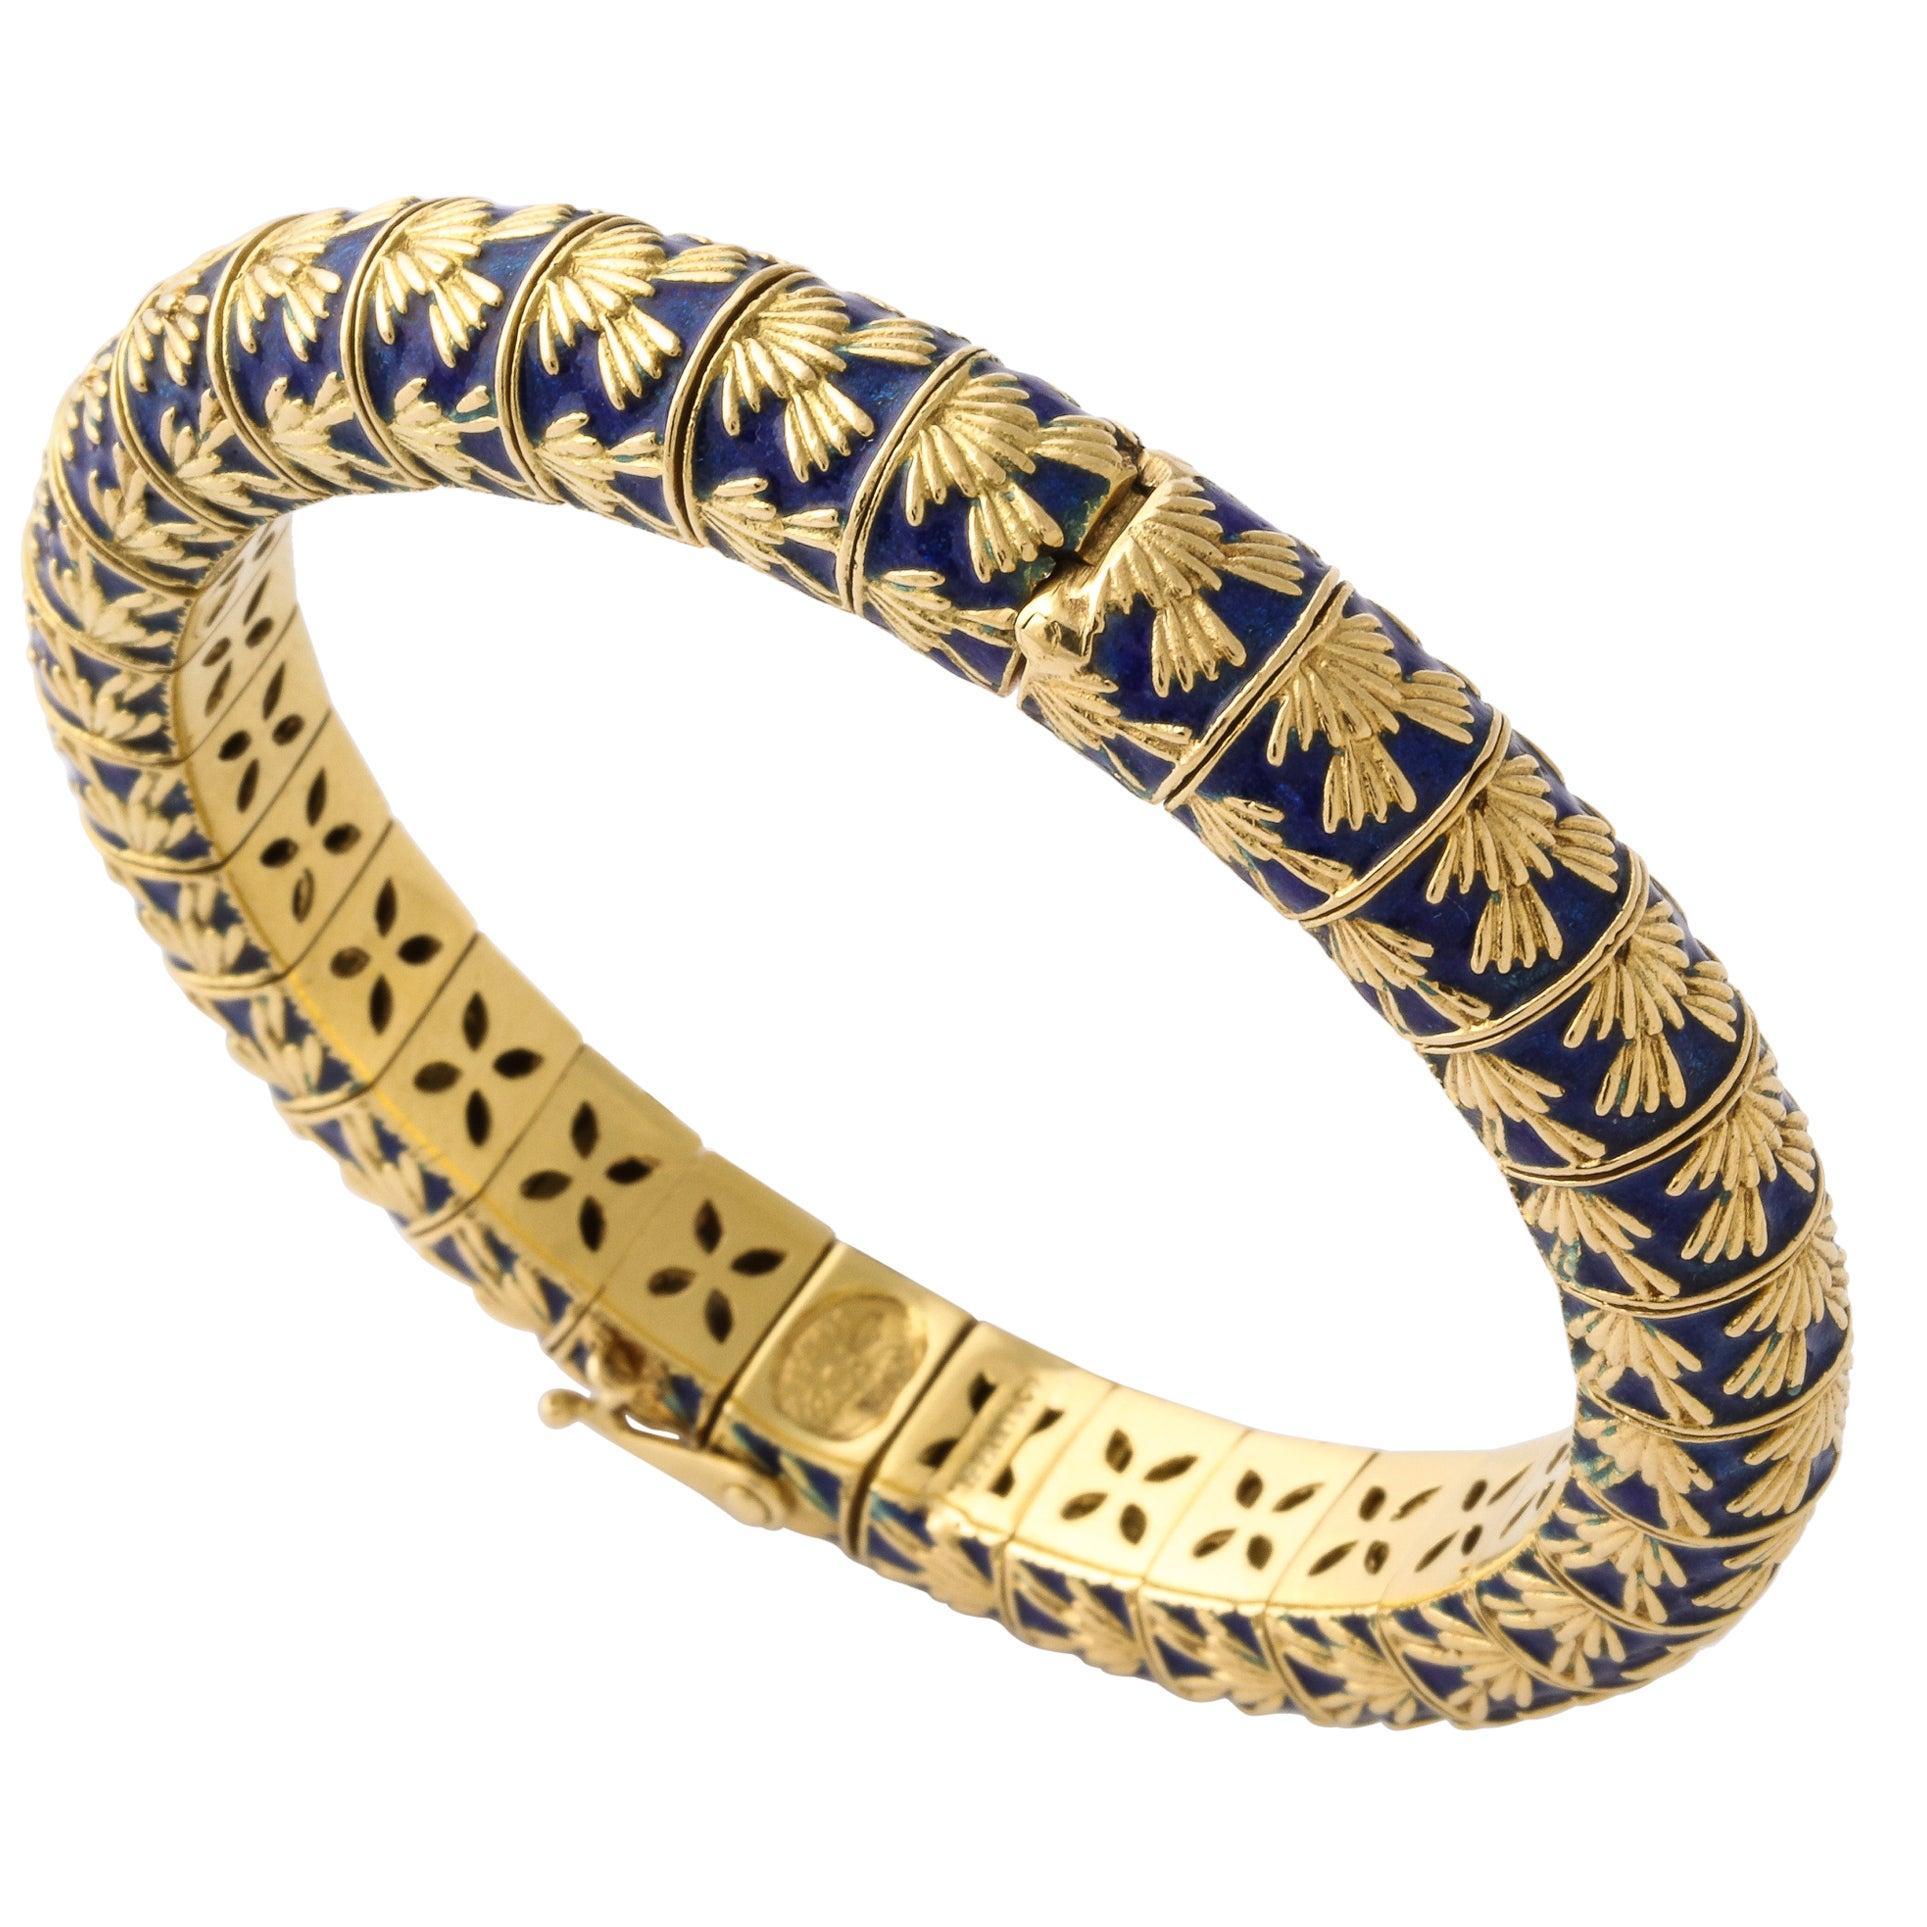 Tiffany & Co. Paris Blue Enamel Gold Bangle Bracelet